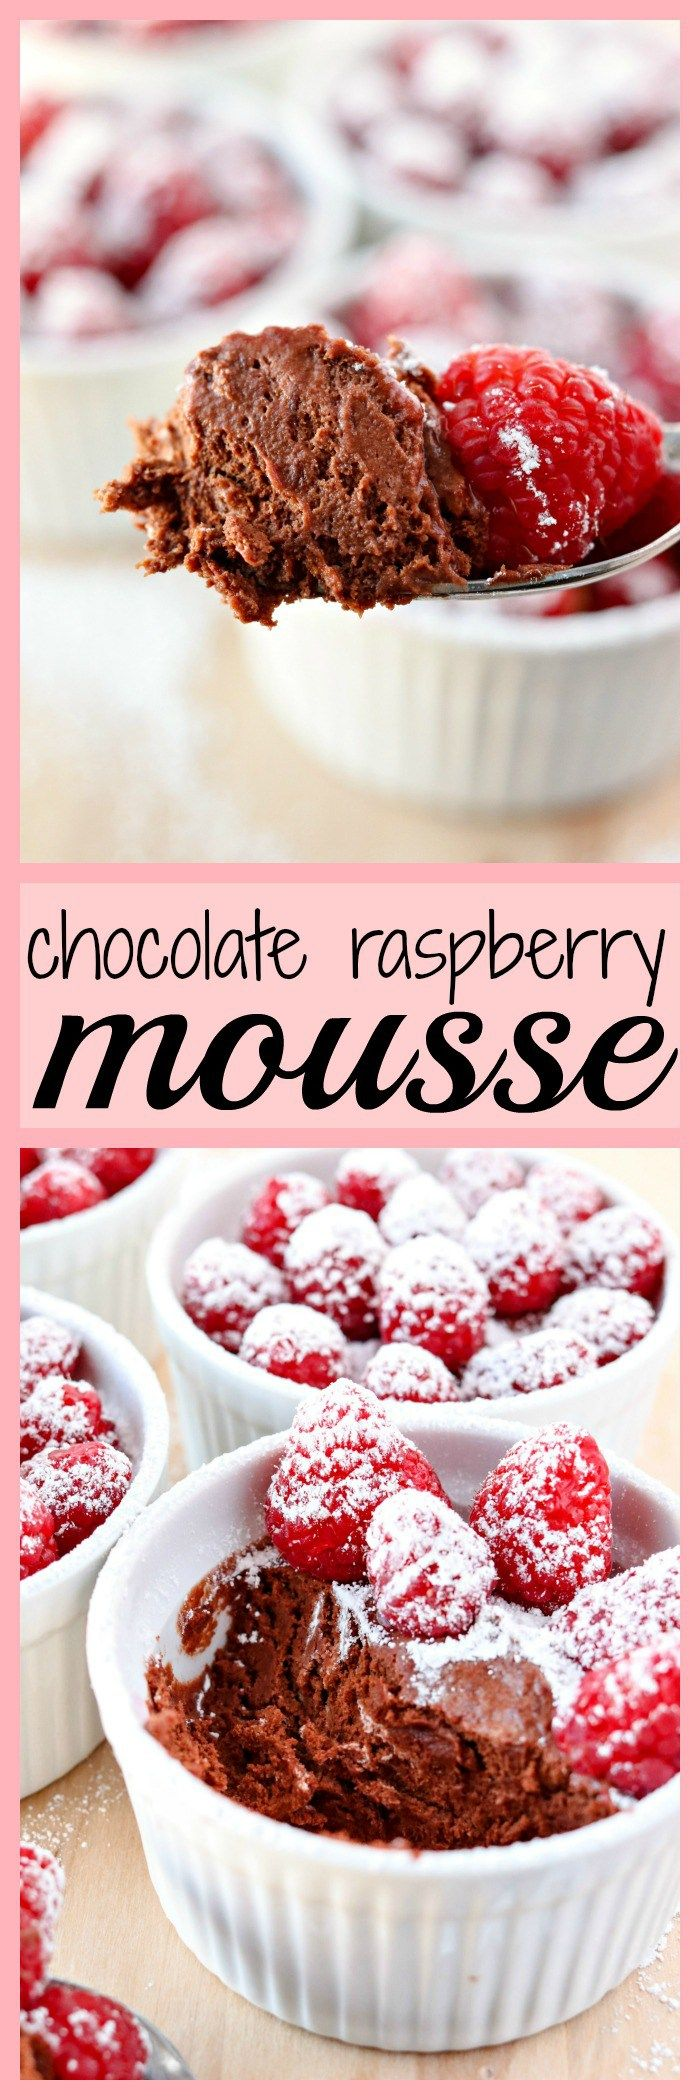 Chocolate Raspberry Mousse Mini Dessertschocolate Dessertseasy Dessertsdelicious Dessertsdessert Recipesromantic Dinner For Tworomantic